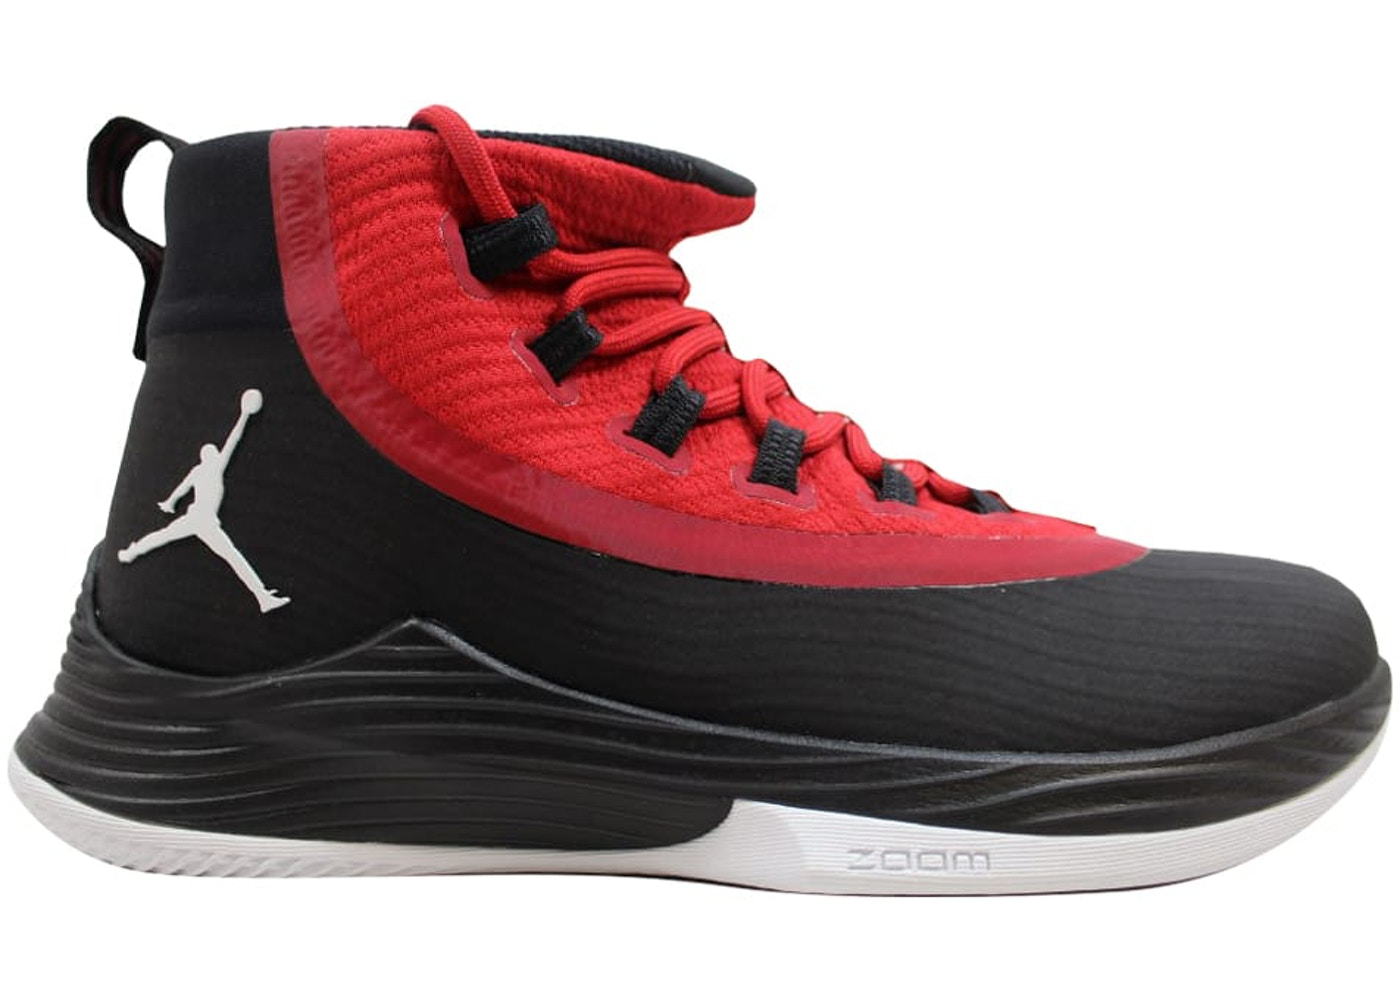 4ceb9558e0c7 Air Jordan Shoes - Volatility